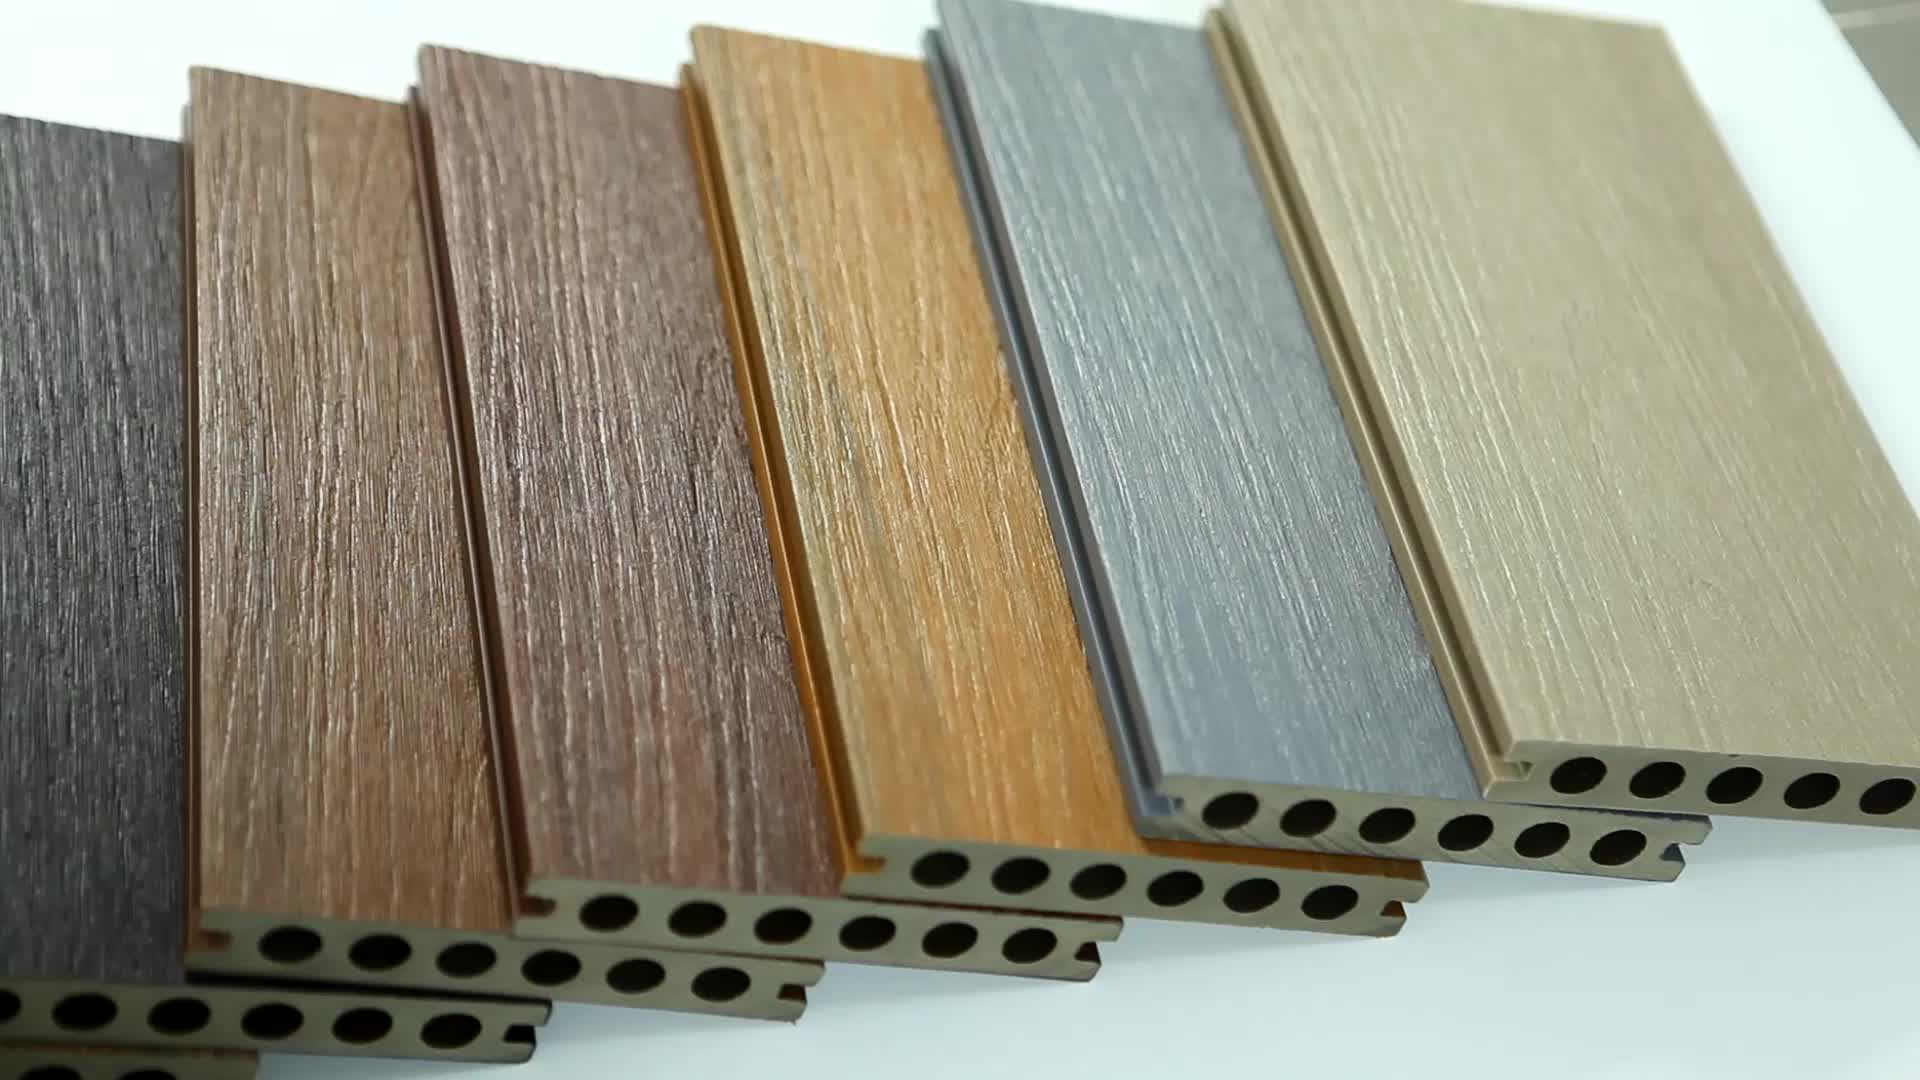 Grau vinyl klick boden 100 platz meter laminat bodenbelag holz holz hohe qualität verwendet tragbare verriegelung decking bodenbelag